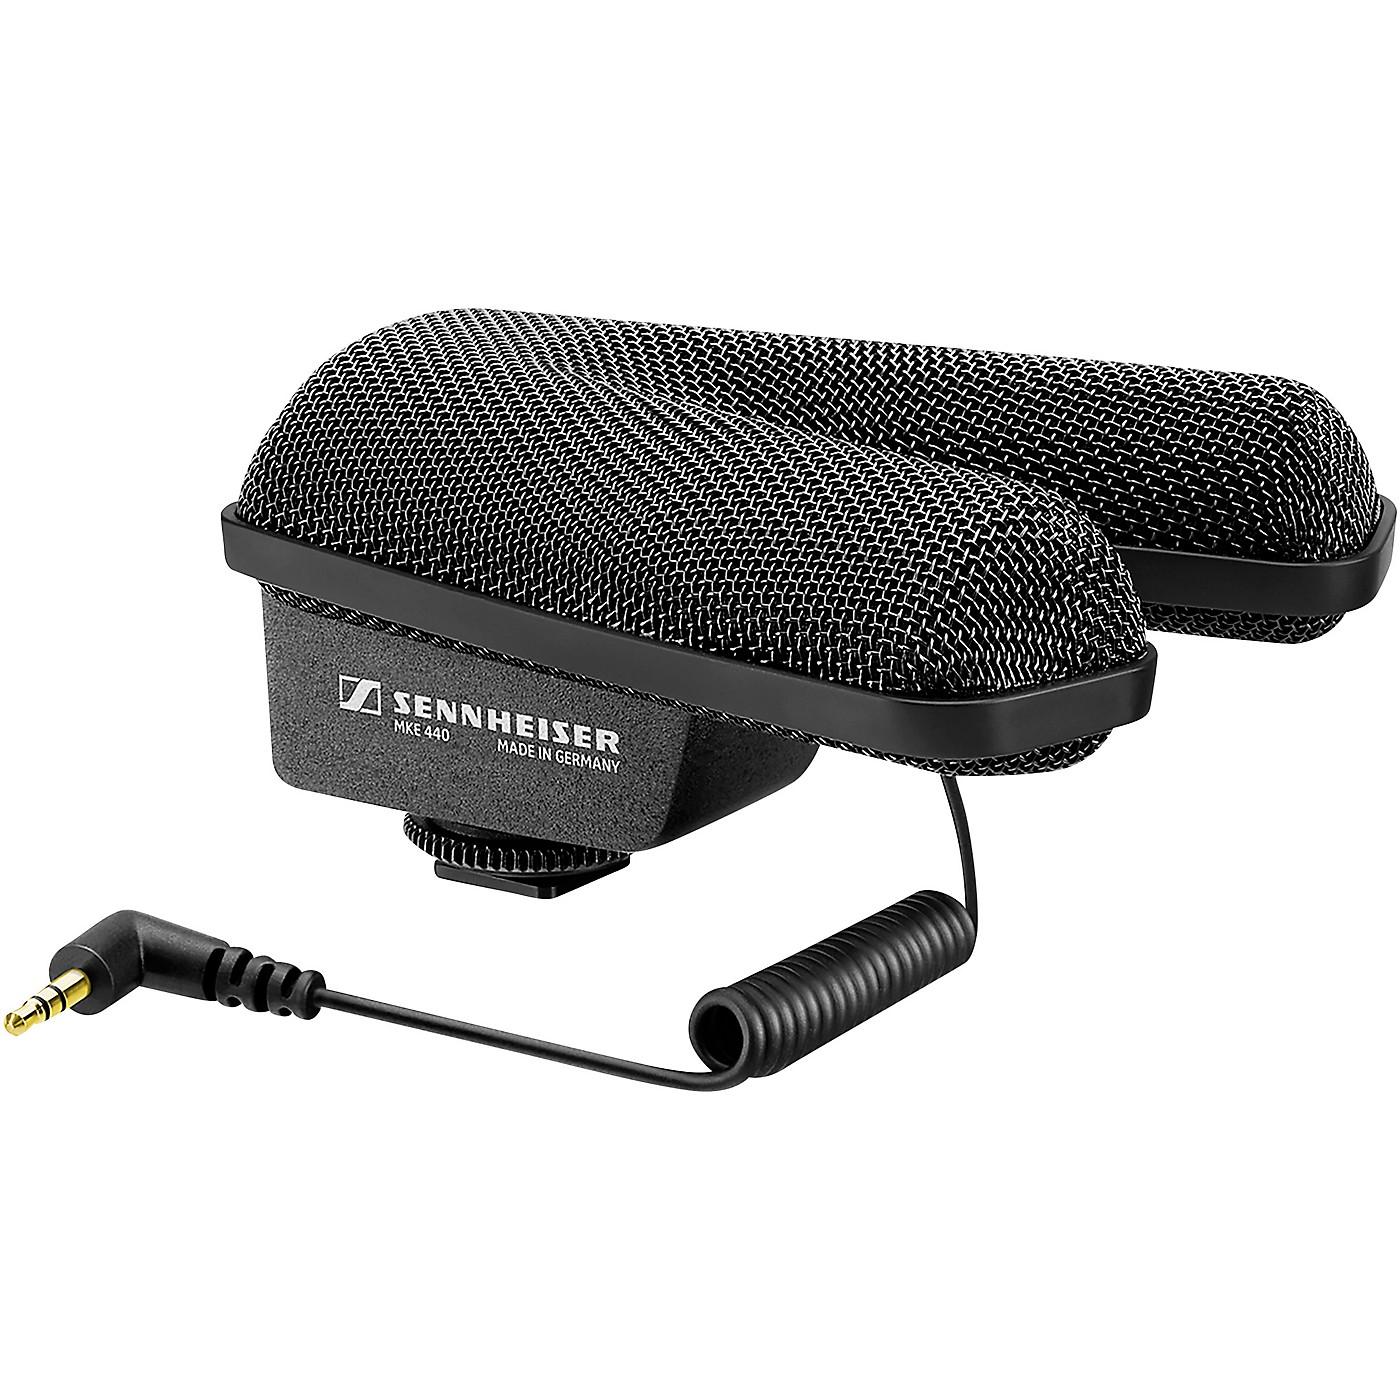 Sennheiser MKE440P Microphone thumbnail